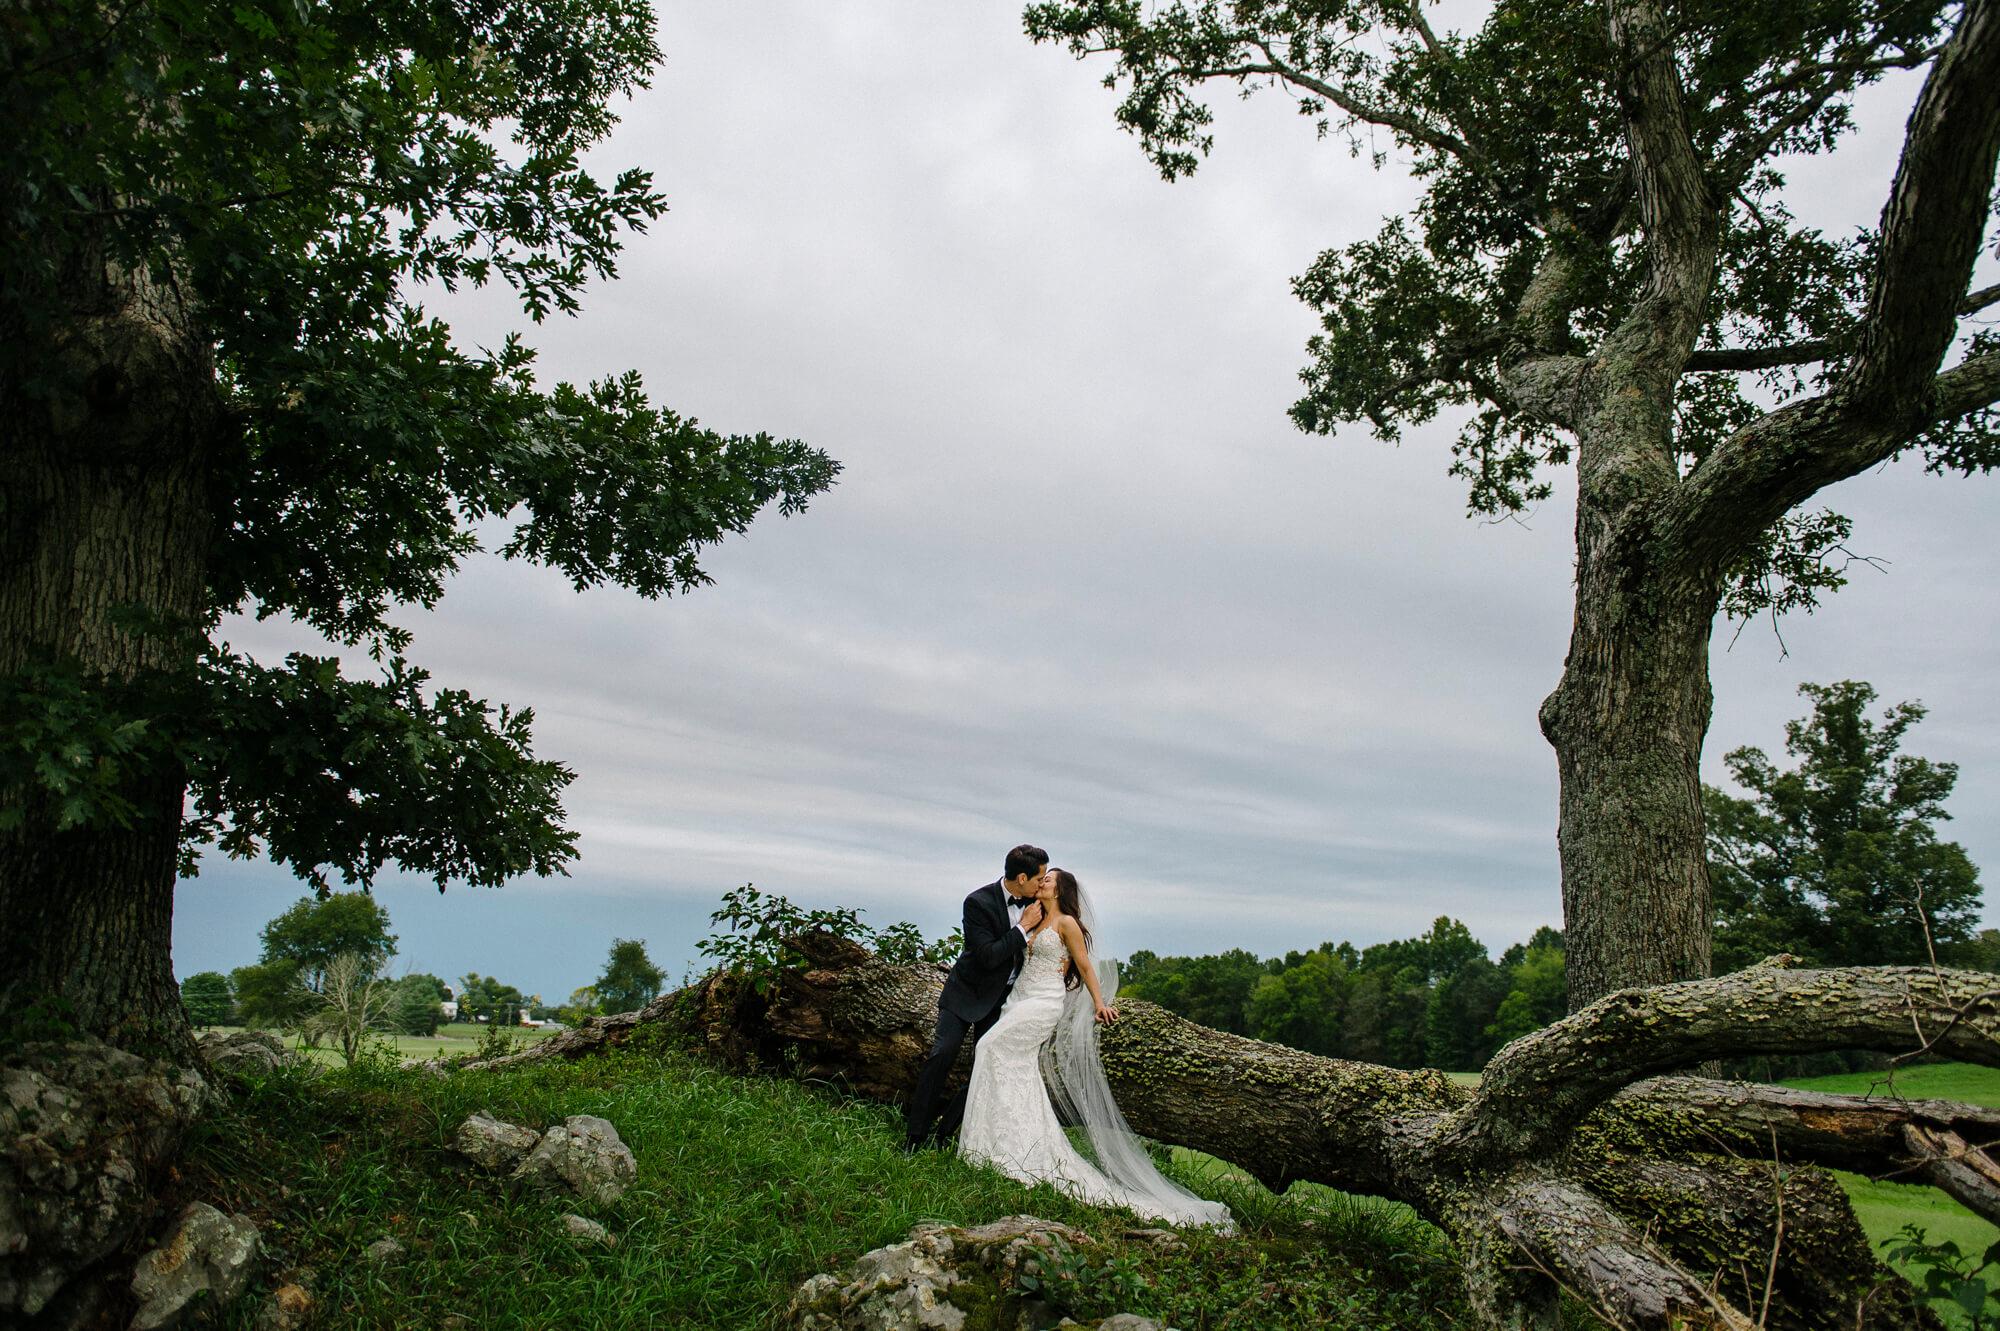 great-marsh-estate-wedding-virginia-photos-traveling-wedding-photographer-18.JPG